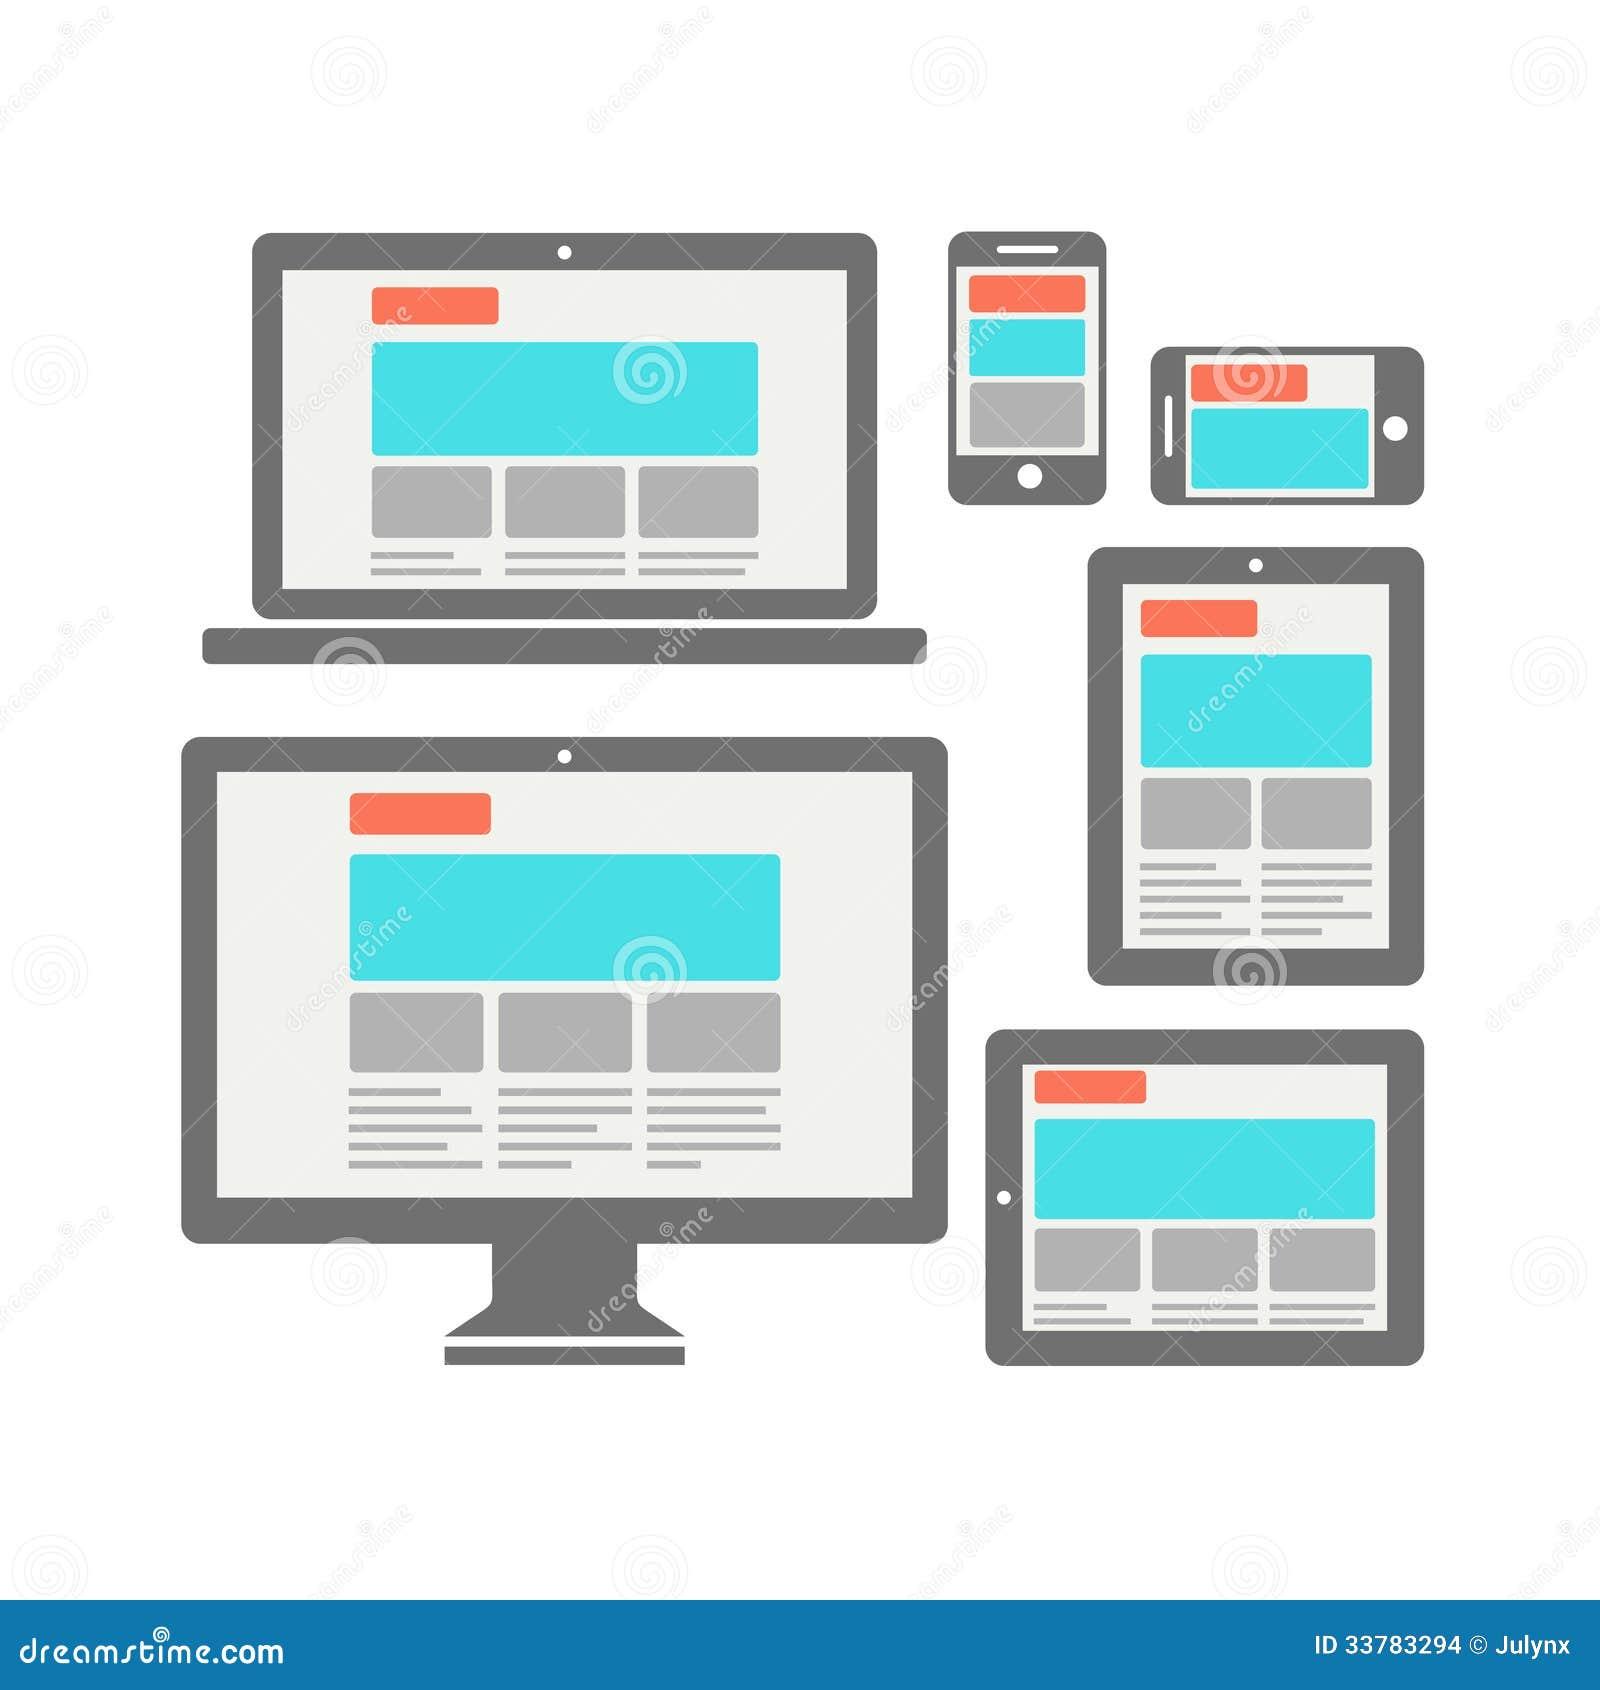 fully responsive web design stock vector image 33783294. Black Bedroom Furniture Sets. Home Design Ideas